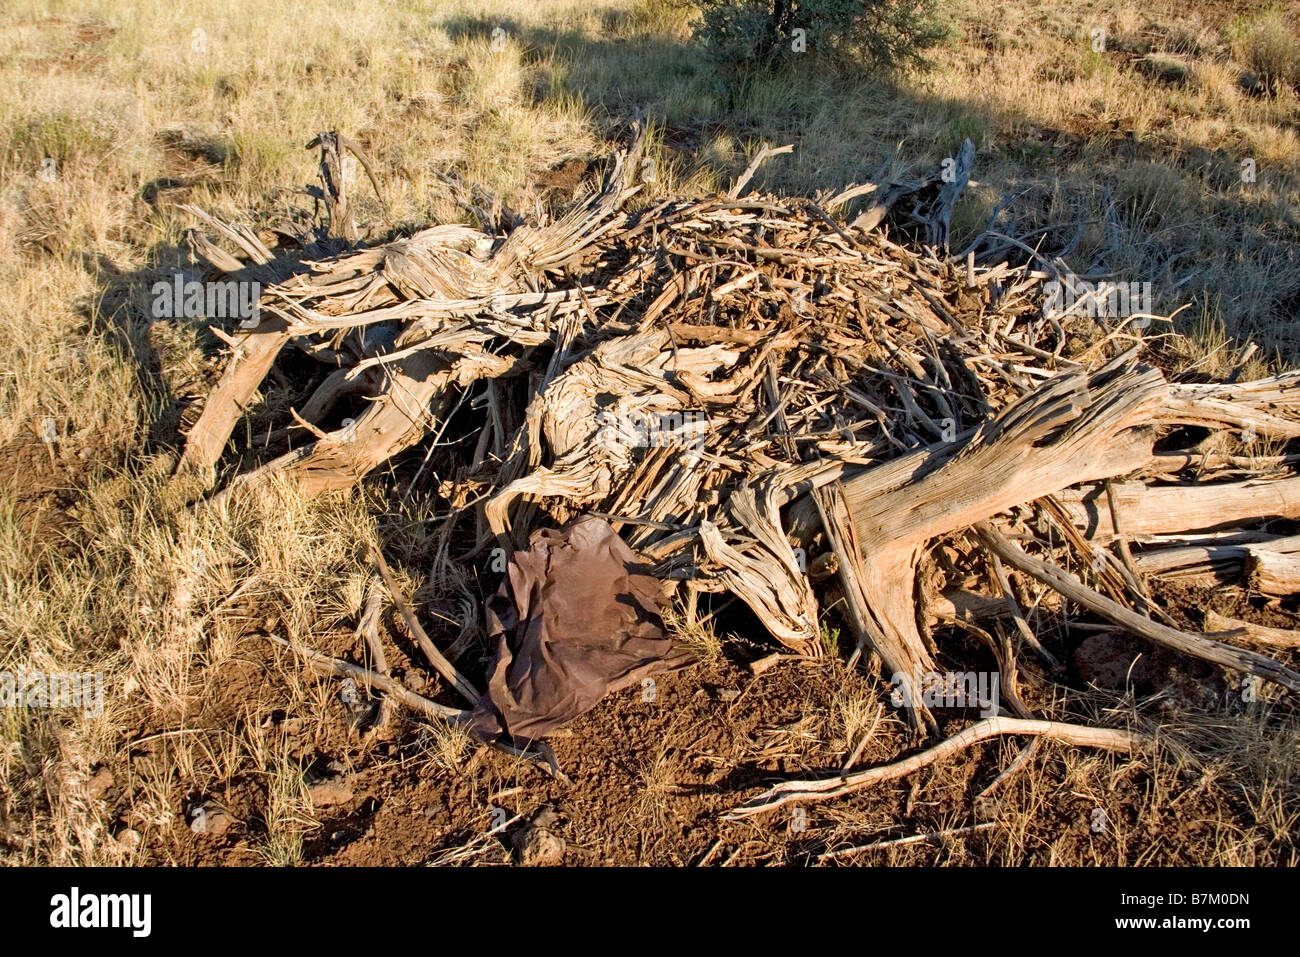 Stephans Woodrat Midden (Nest) Neotoma Stephensi in der Nähe von Showlow Arizona USA 17 Juli Midden Polypodiaceae Stockbild